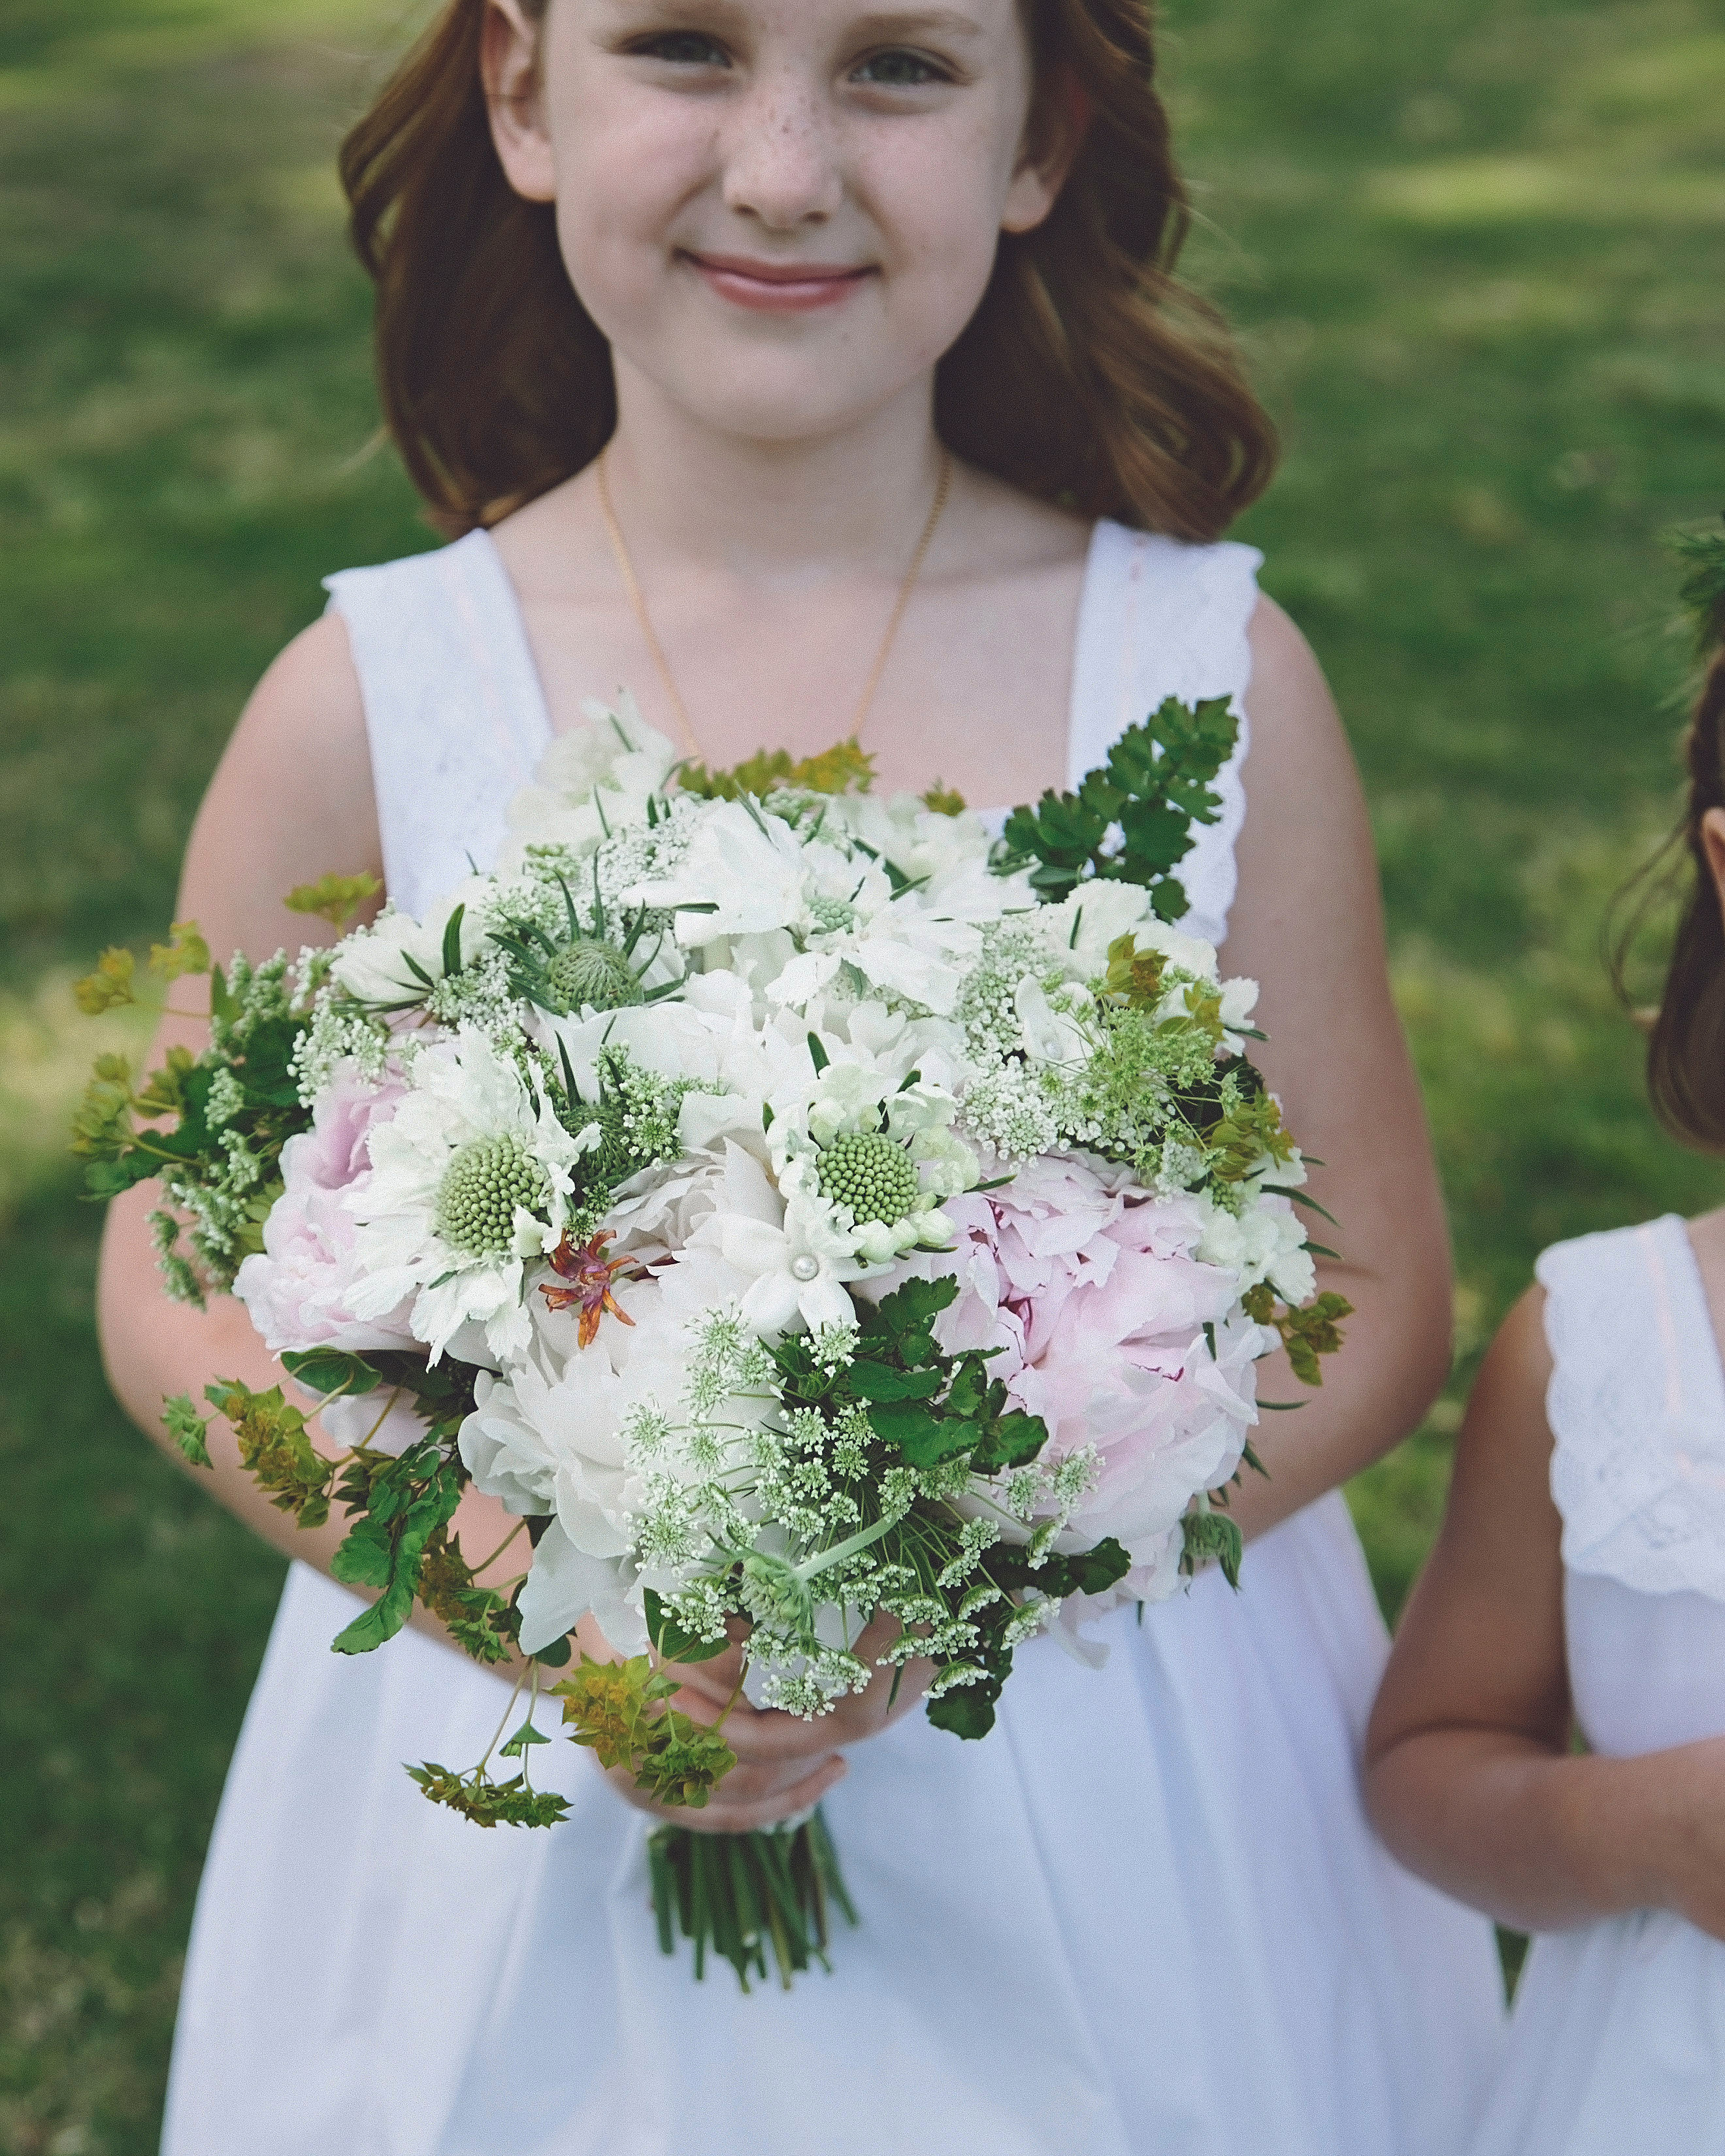 molly-greg-wedding-bouquet-00053-s111481-0814.jpg